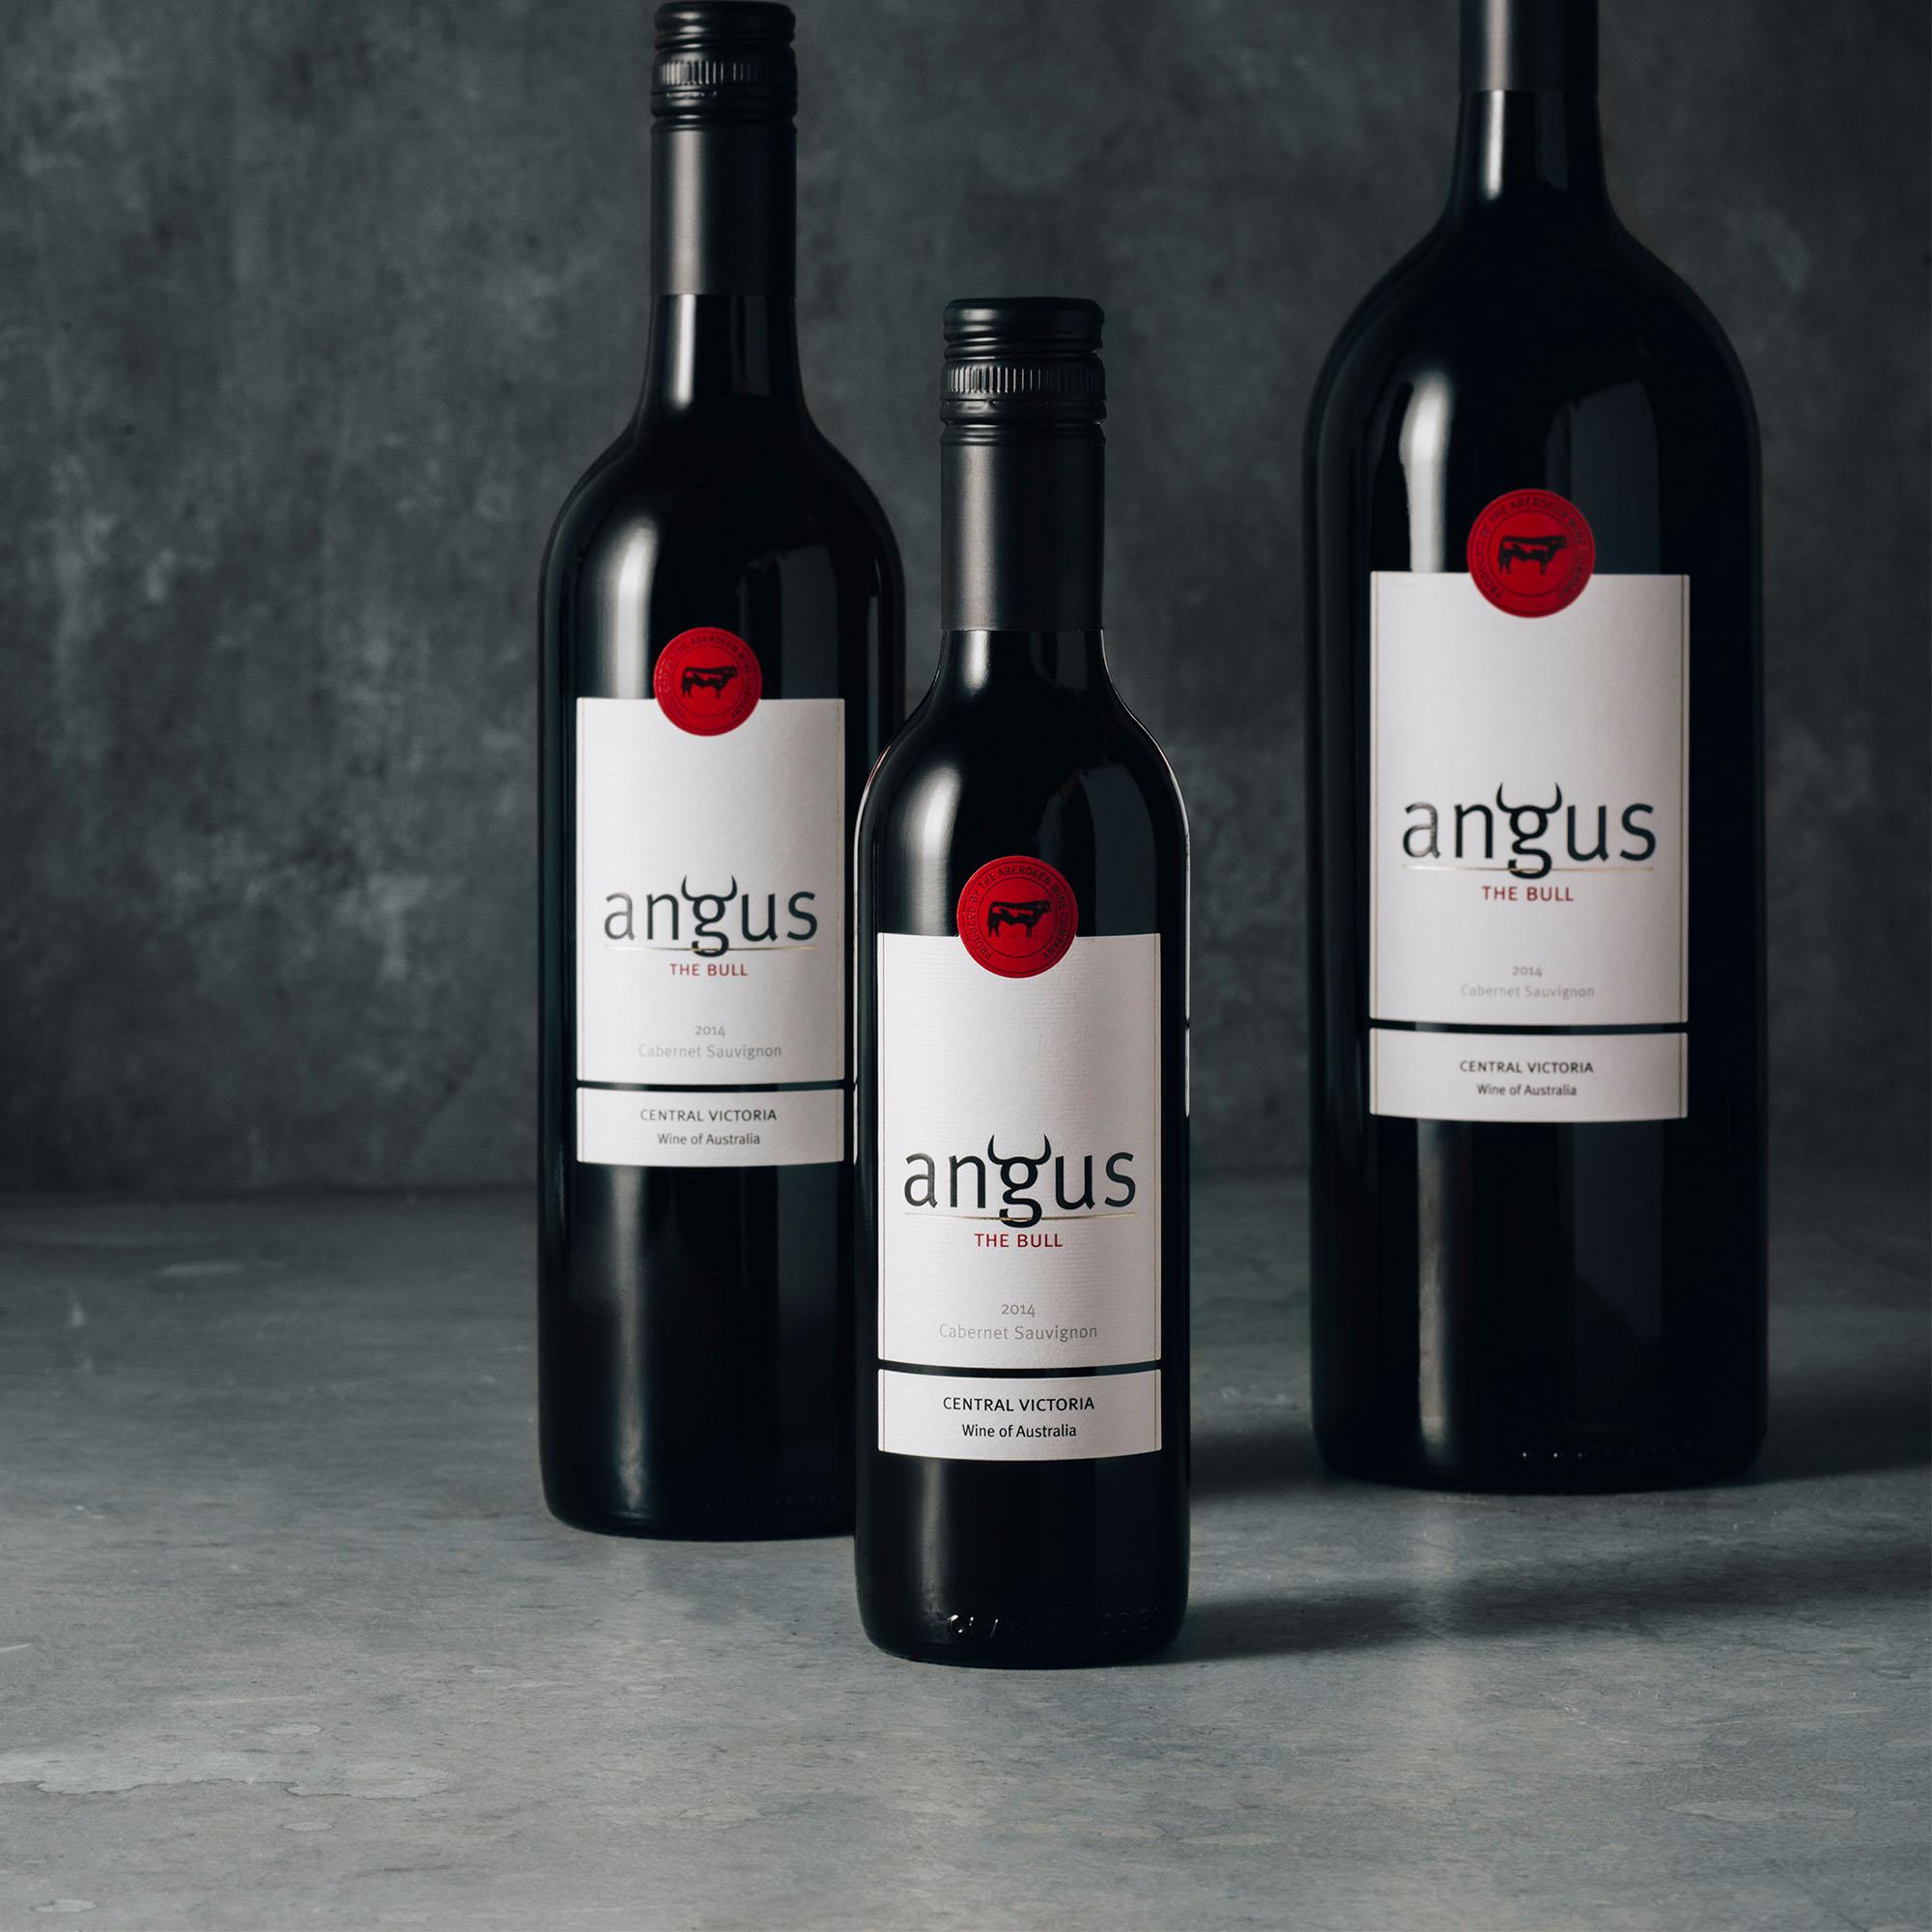 Angus The Bull